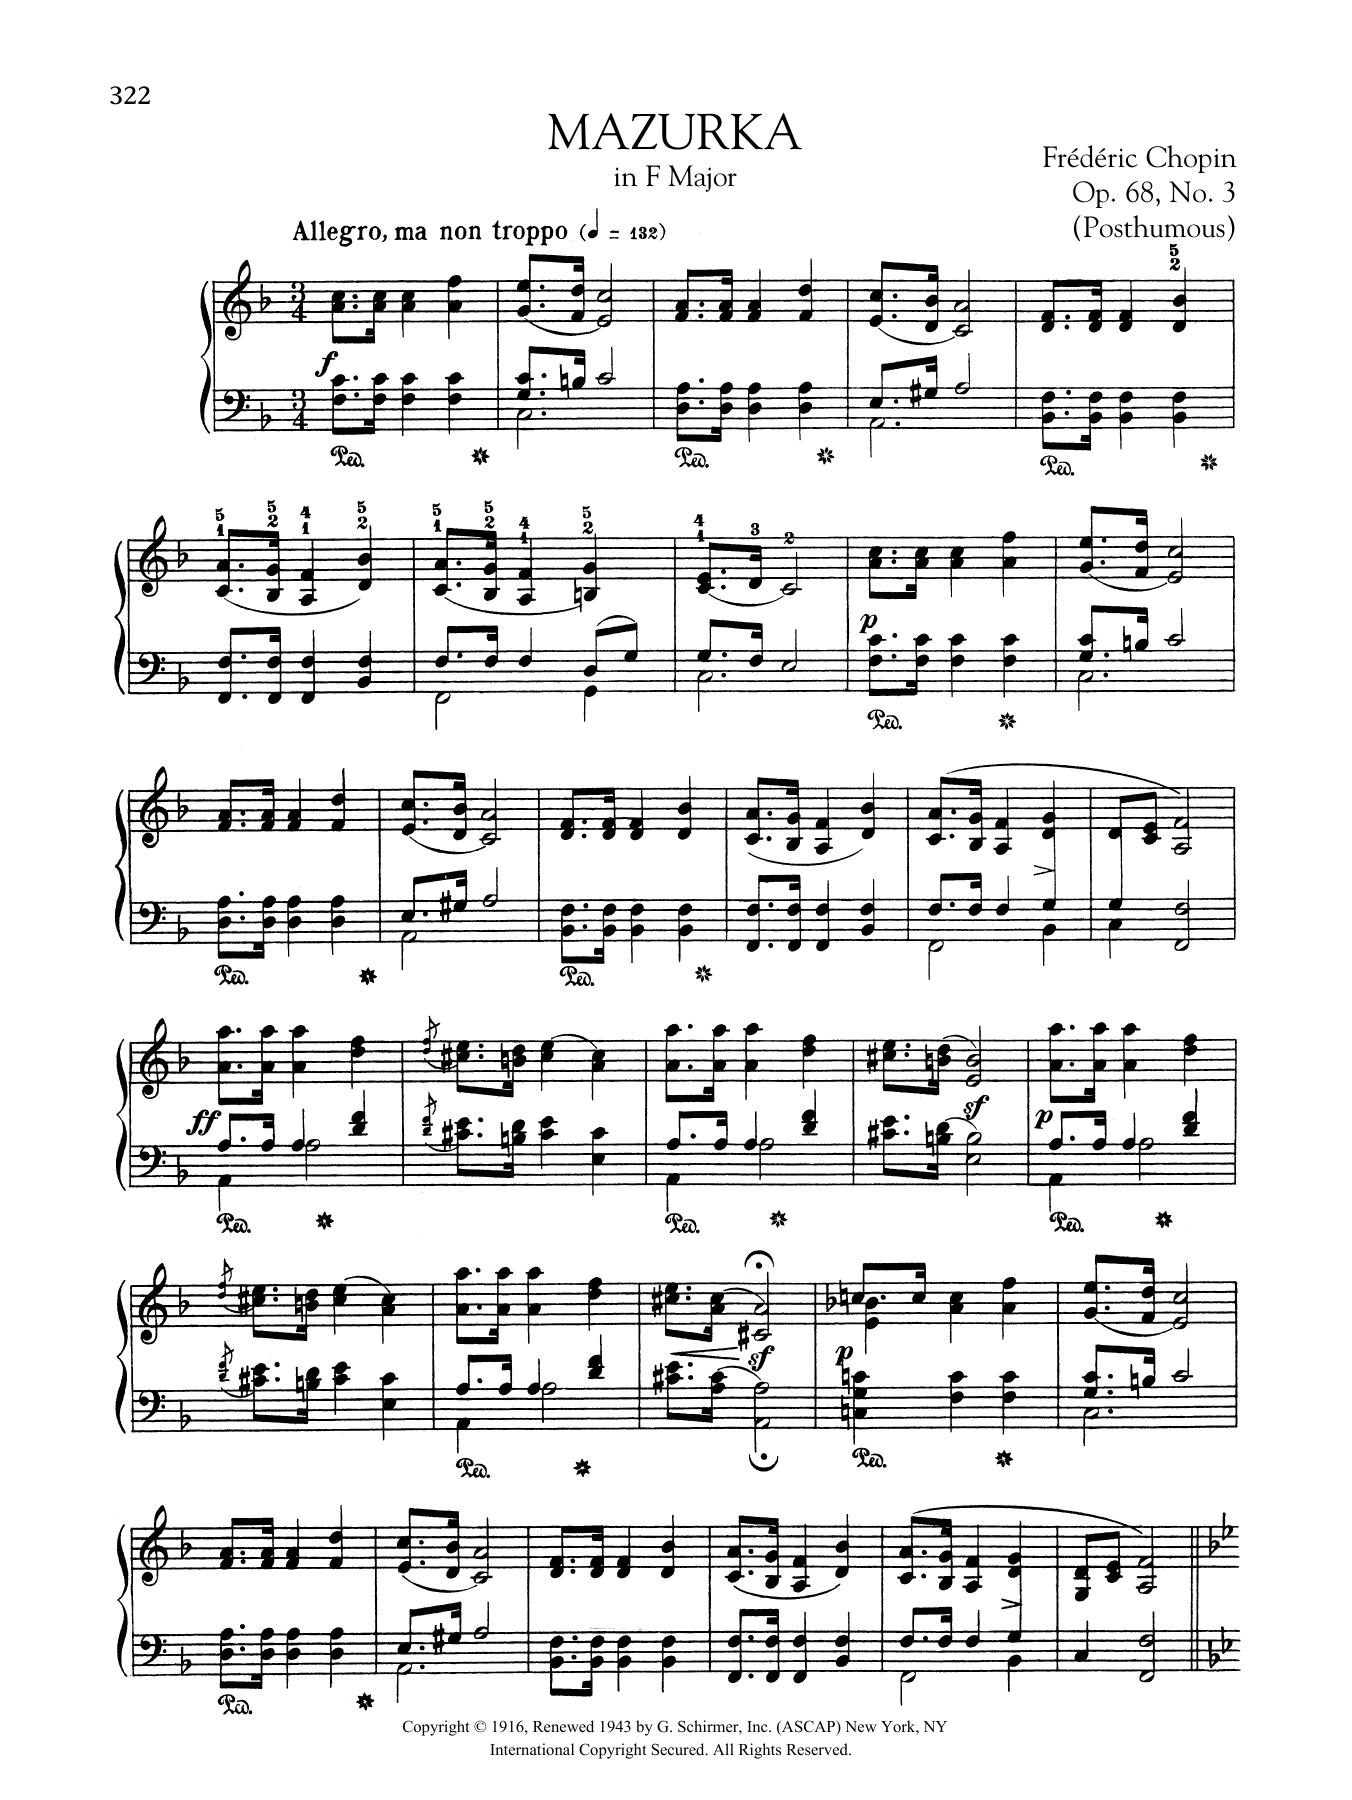 Mazurka in F Major, Op. 68, No. 3 (Posthumous) Sheet Music